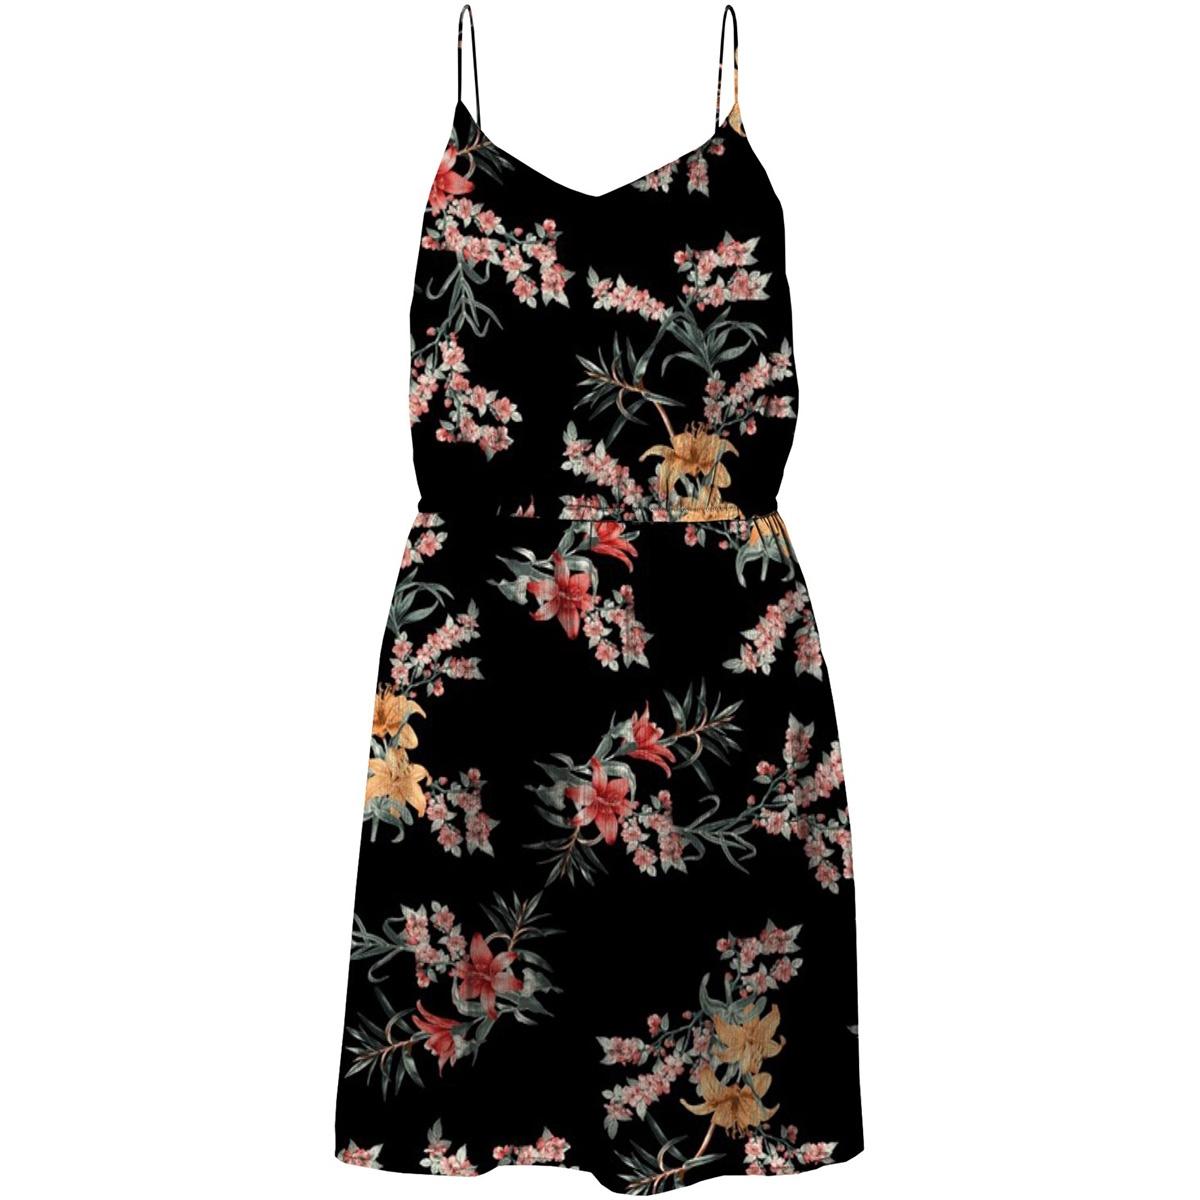 vmwonda singlet short dress exp vero moda jurk black/suki